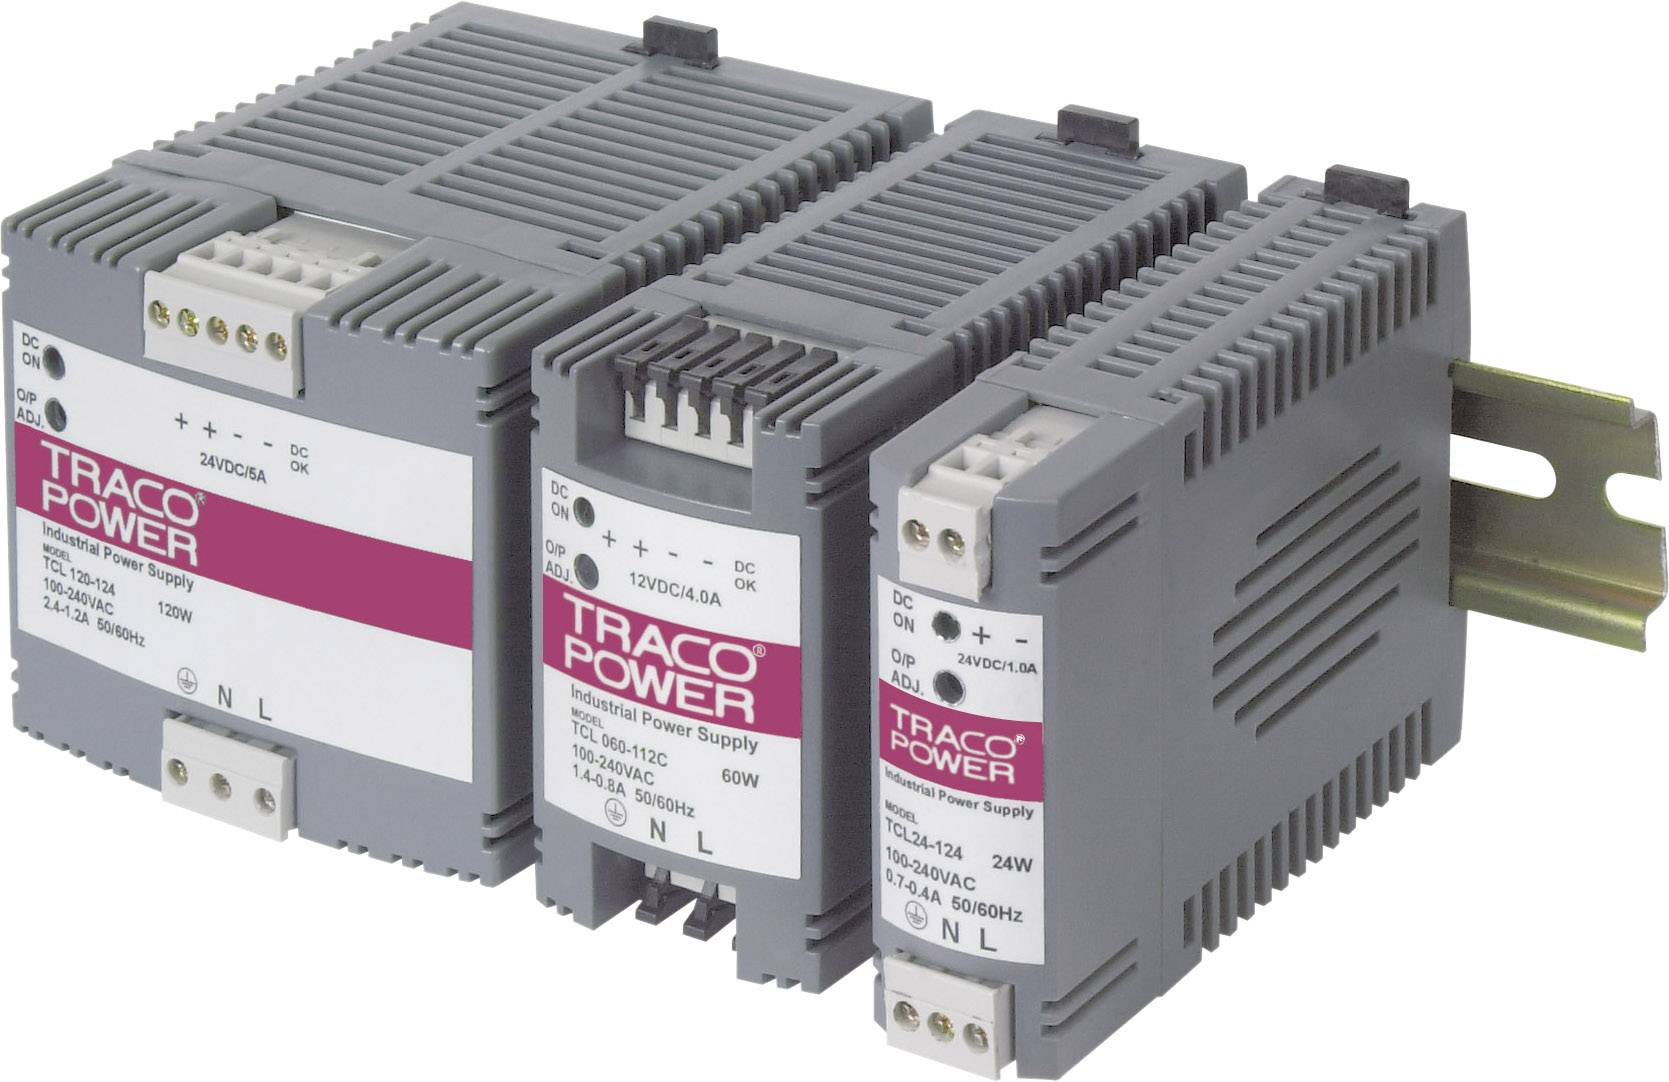 Zdroj na DIN lištu TracoPower TCL 060-148, 48 V/DC, 1,25 A